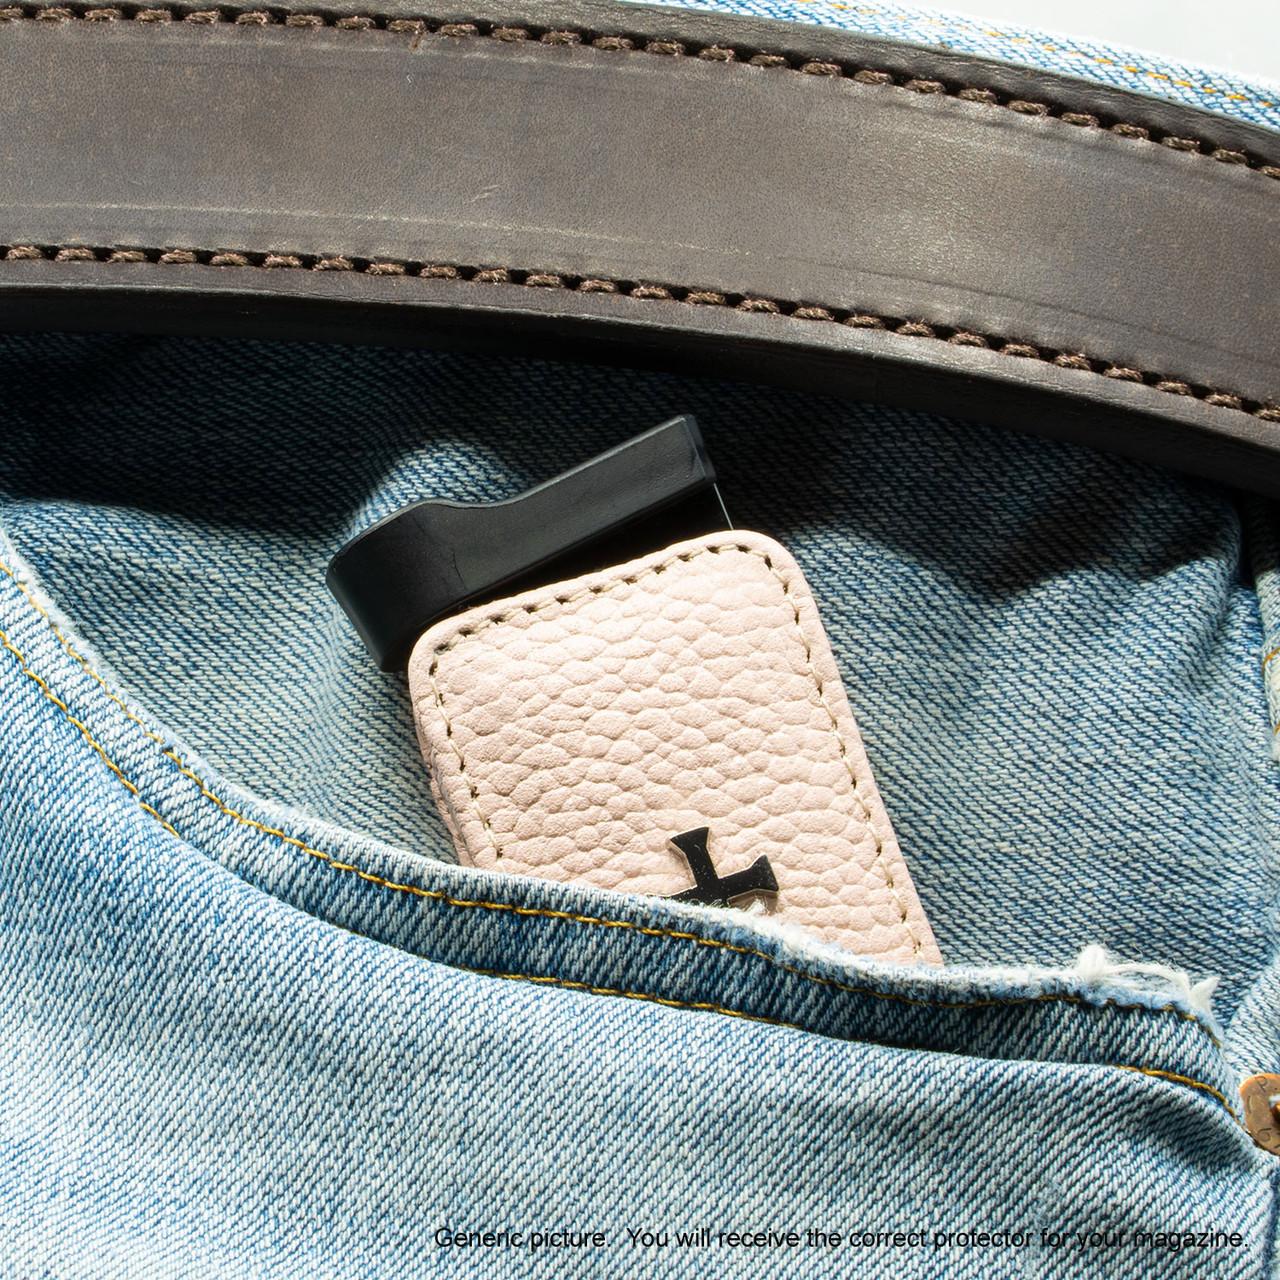 Bersa BP9CC Pink Carry Faithfully Cross Magazine Pocket Protector